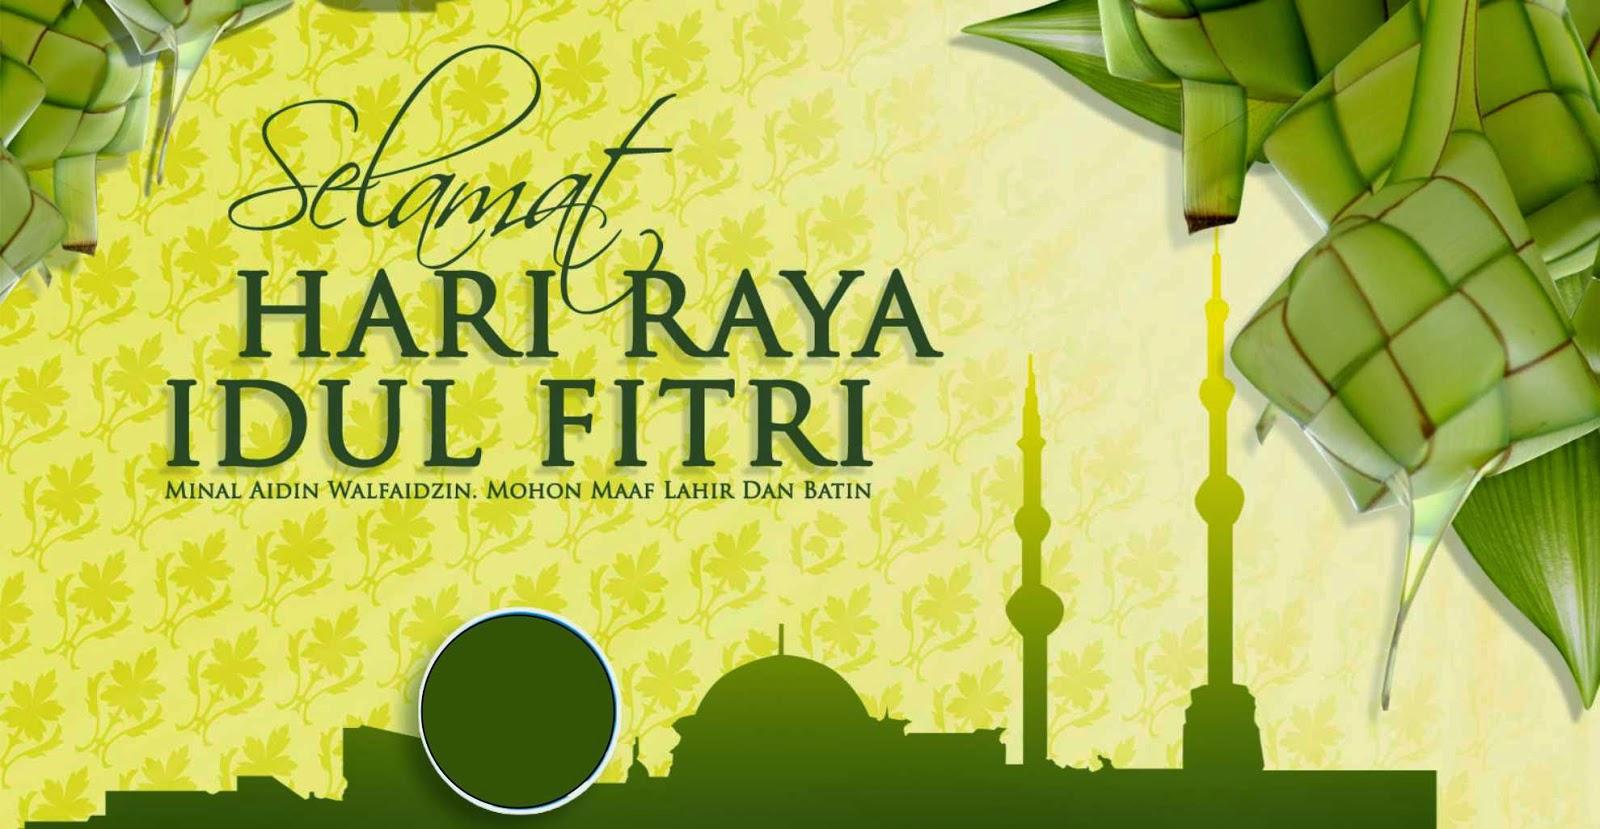 Ucapan Idul Fitri 2016